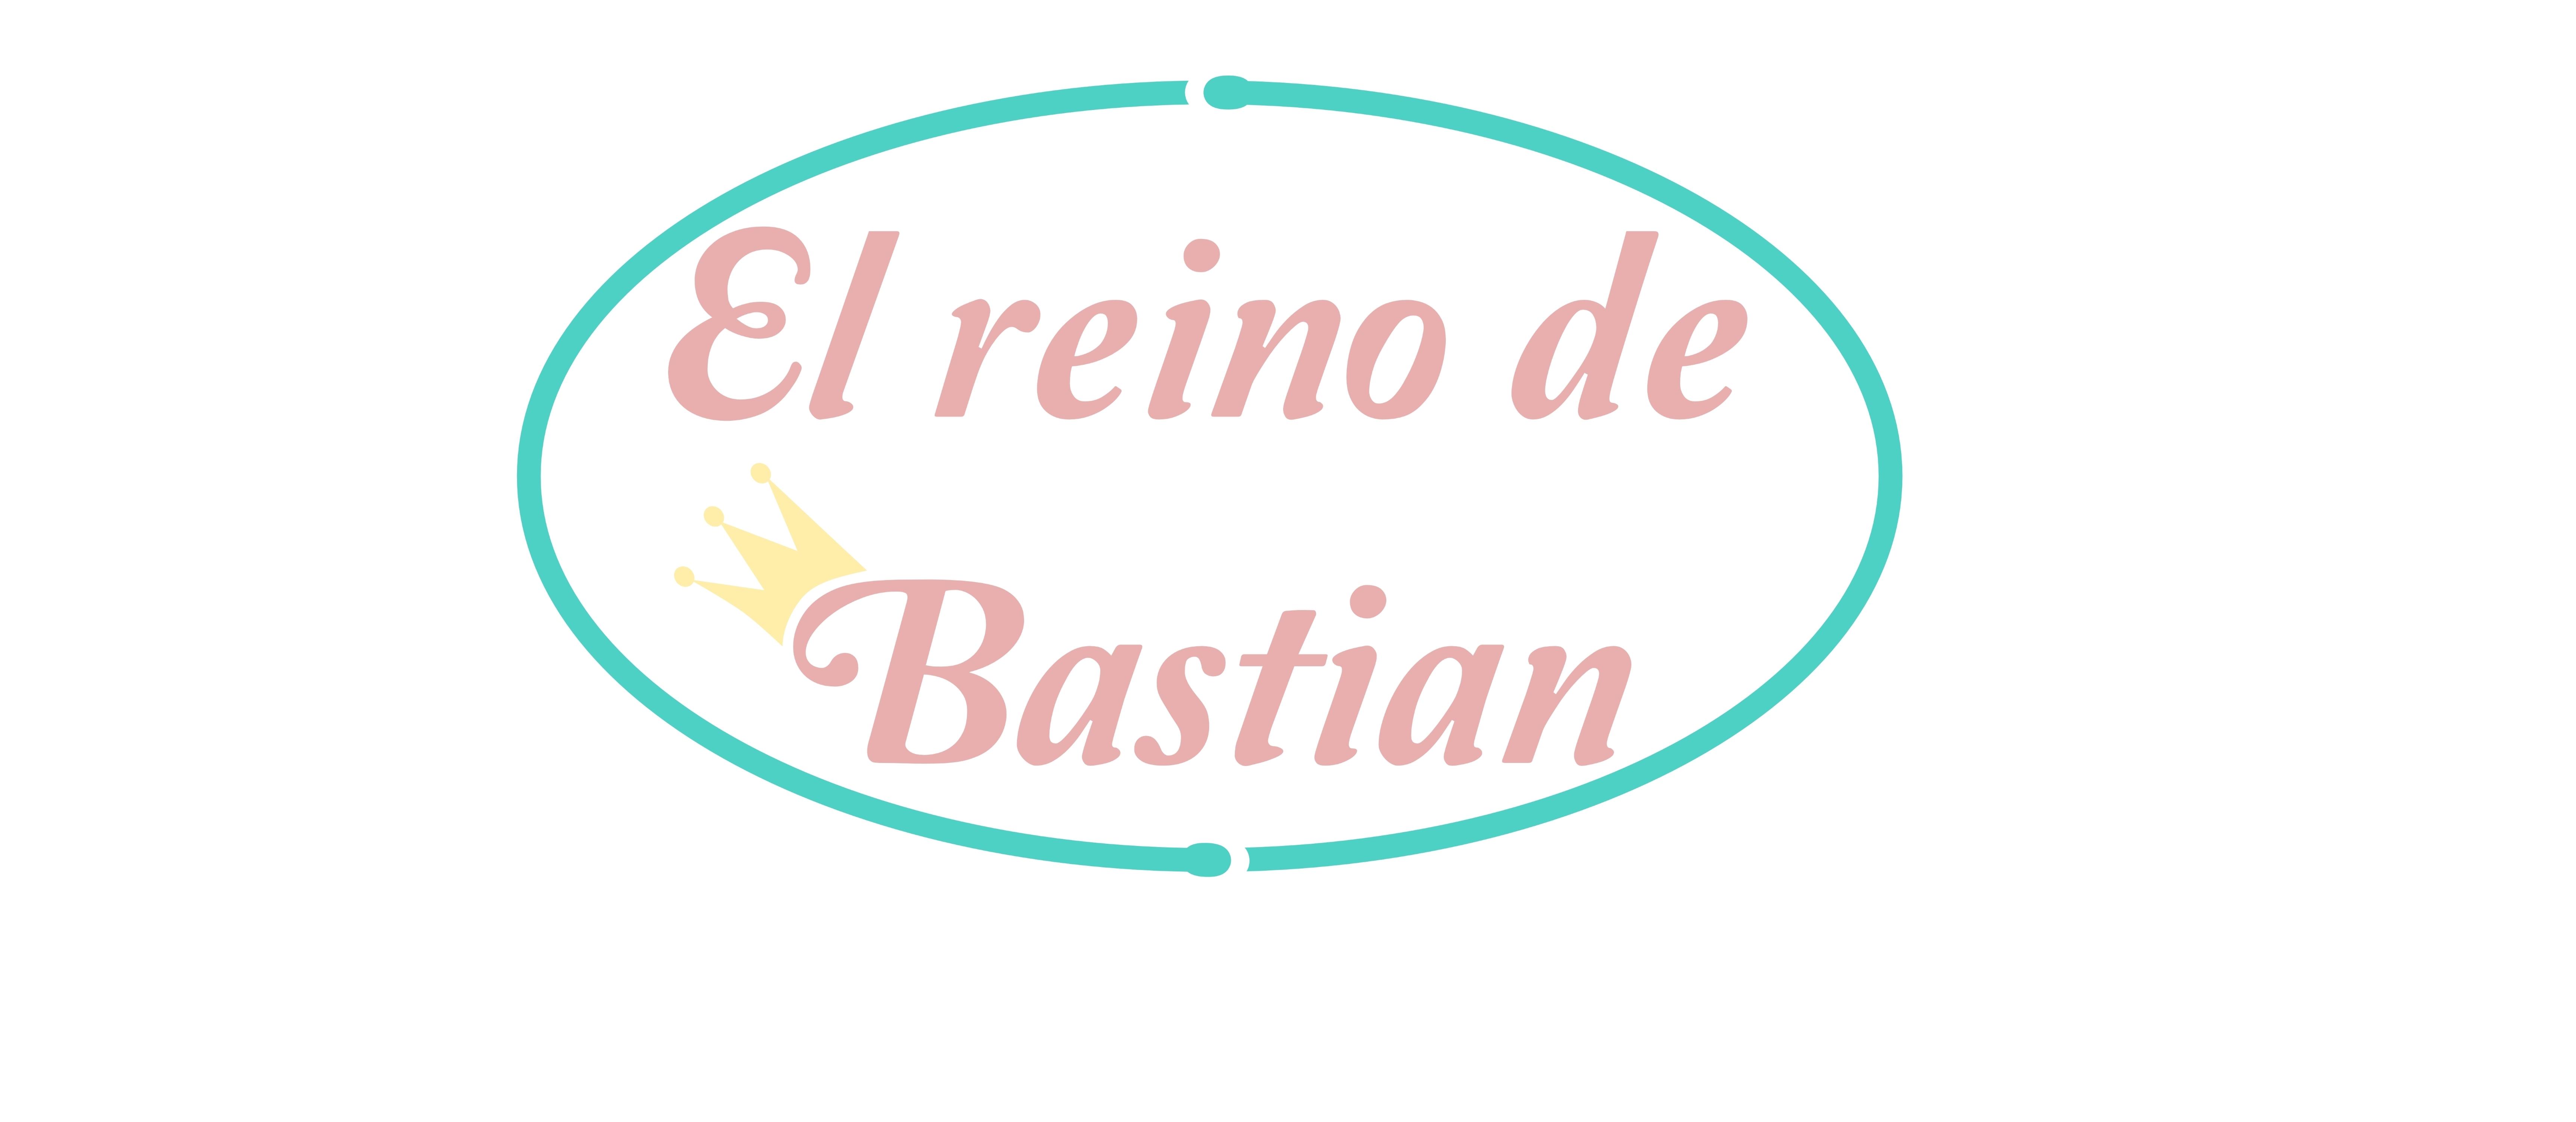 El reino de Bastian